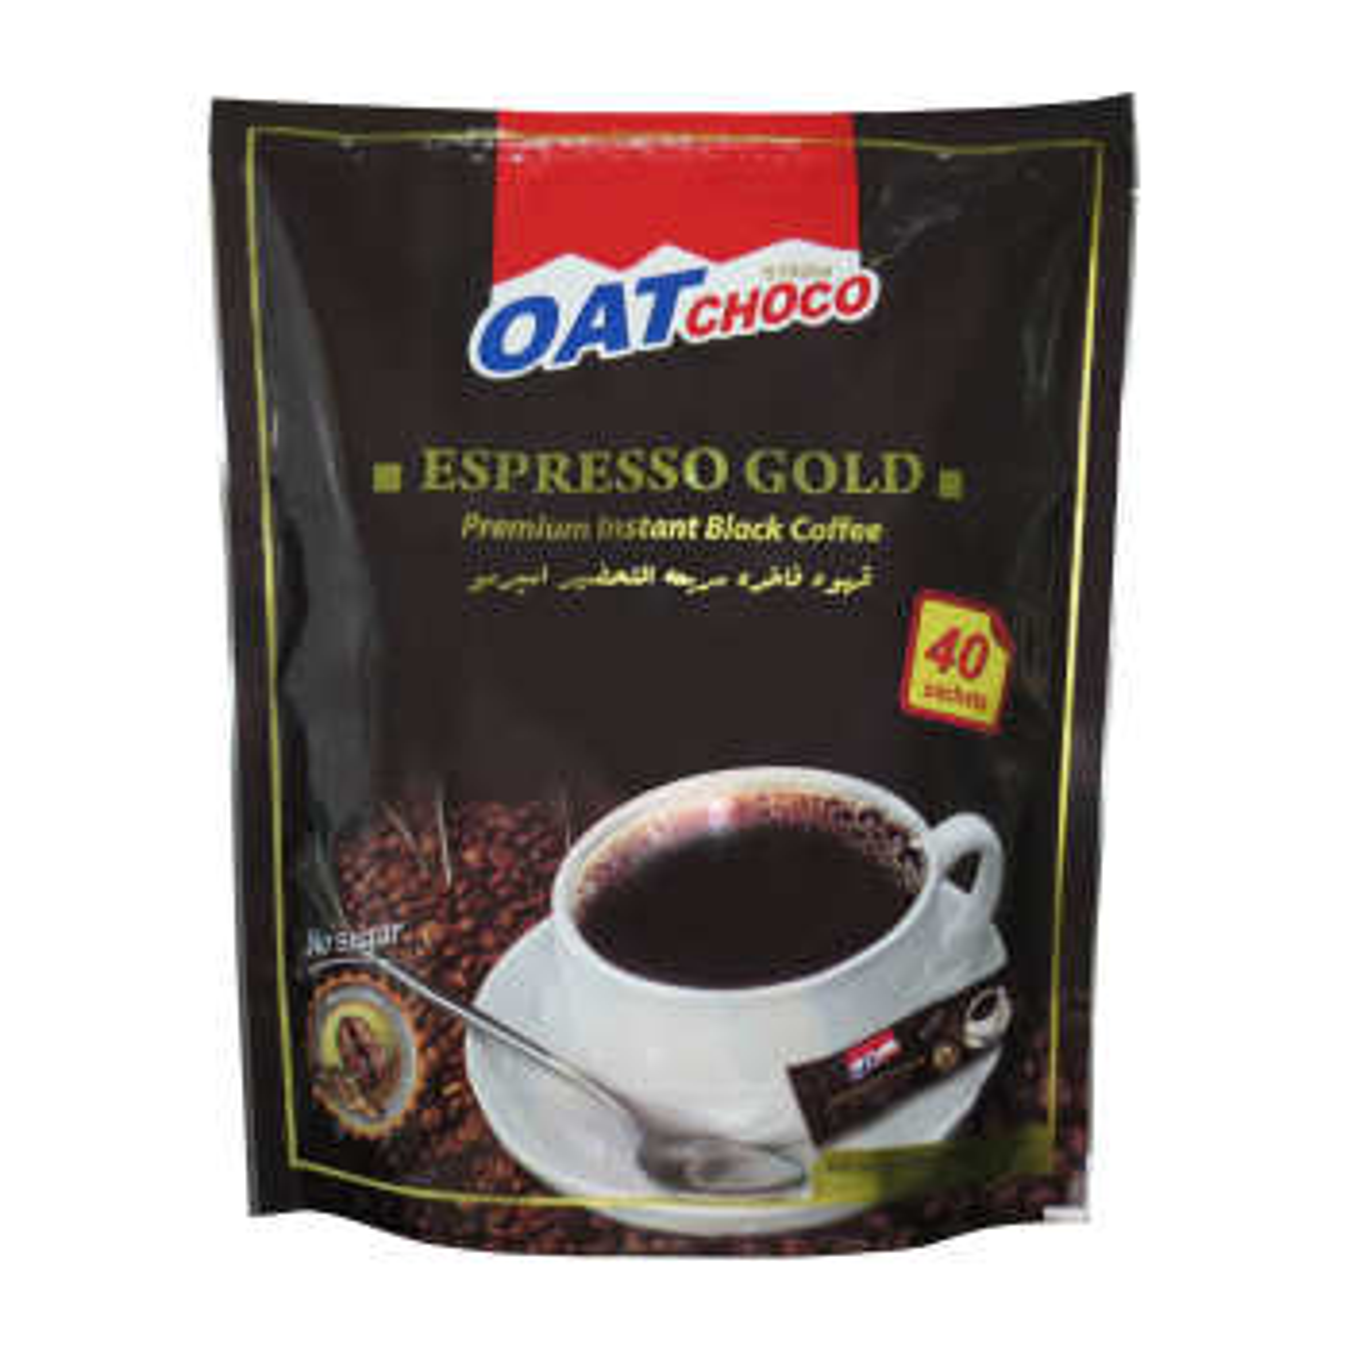 پودر قهوه فوری اوت چوکو بسته 40 عددی